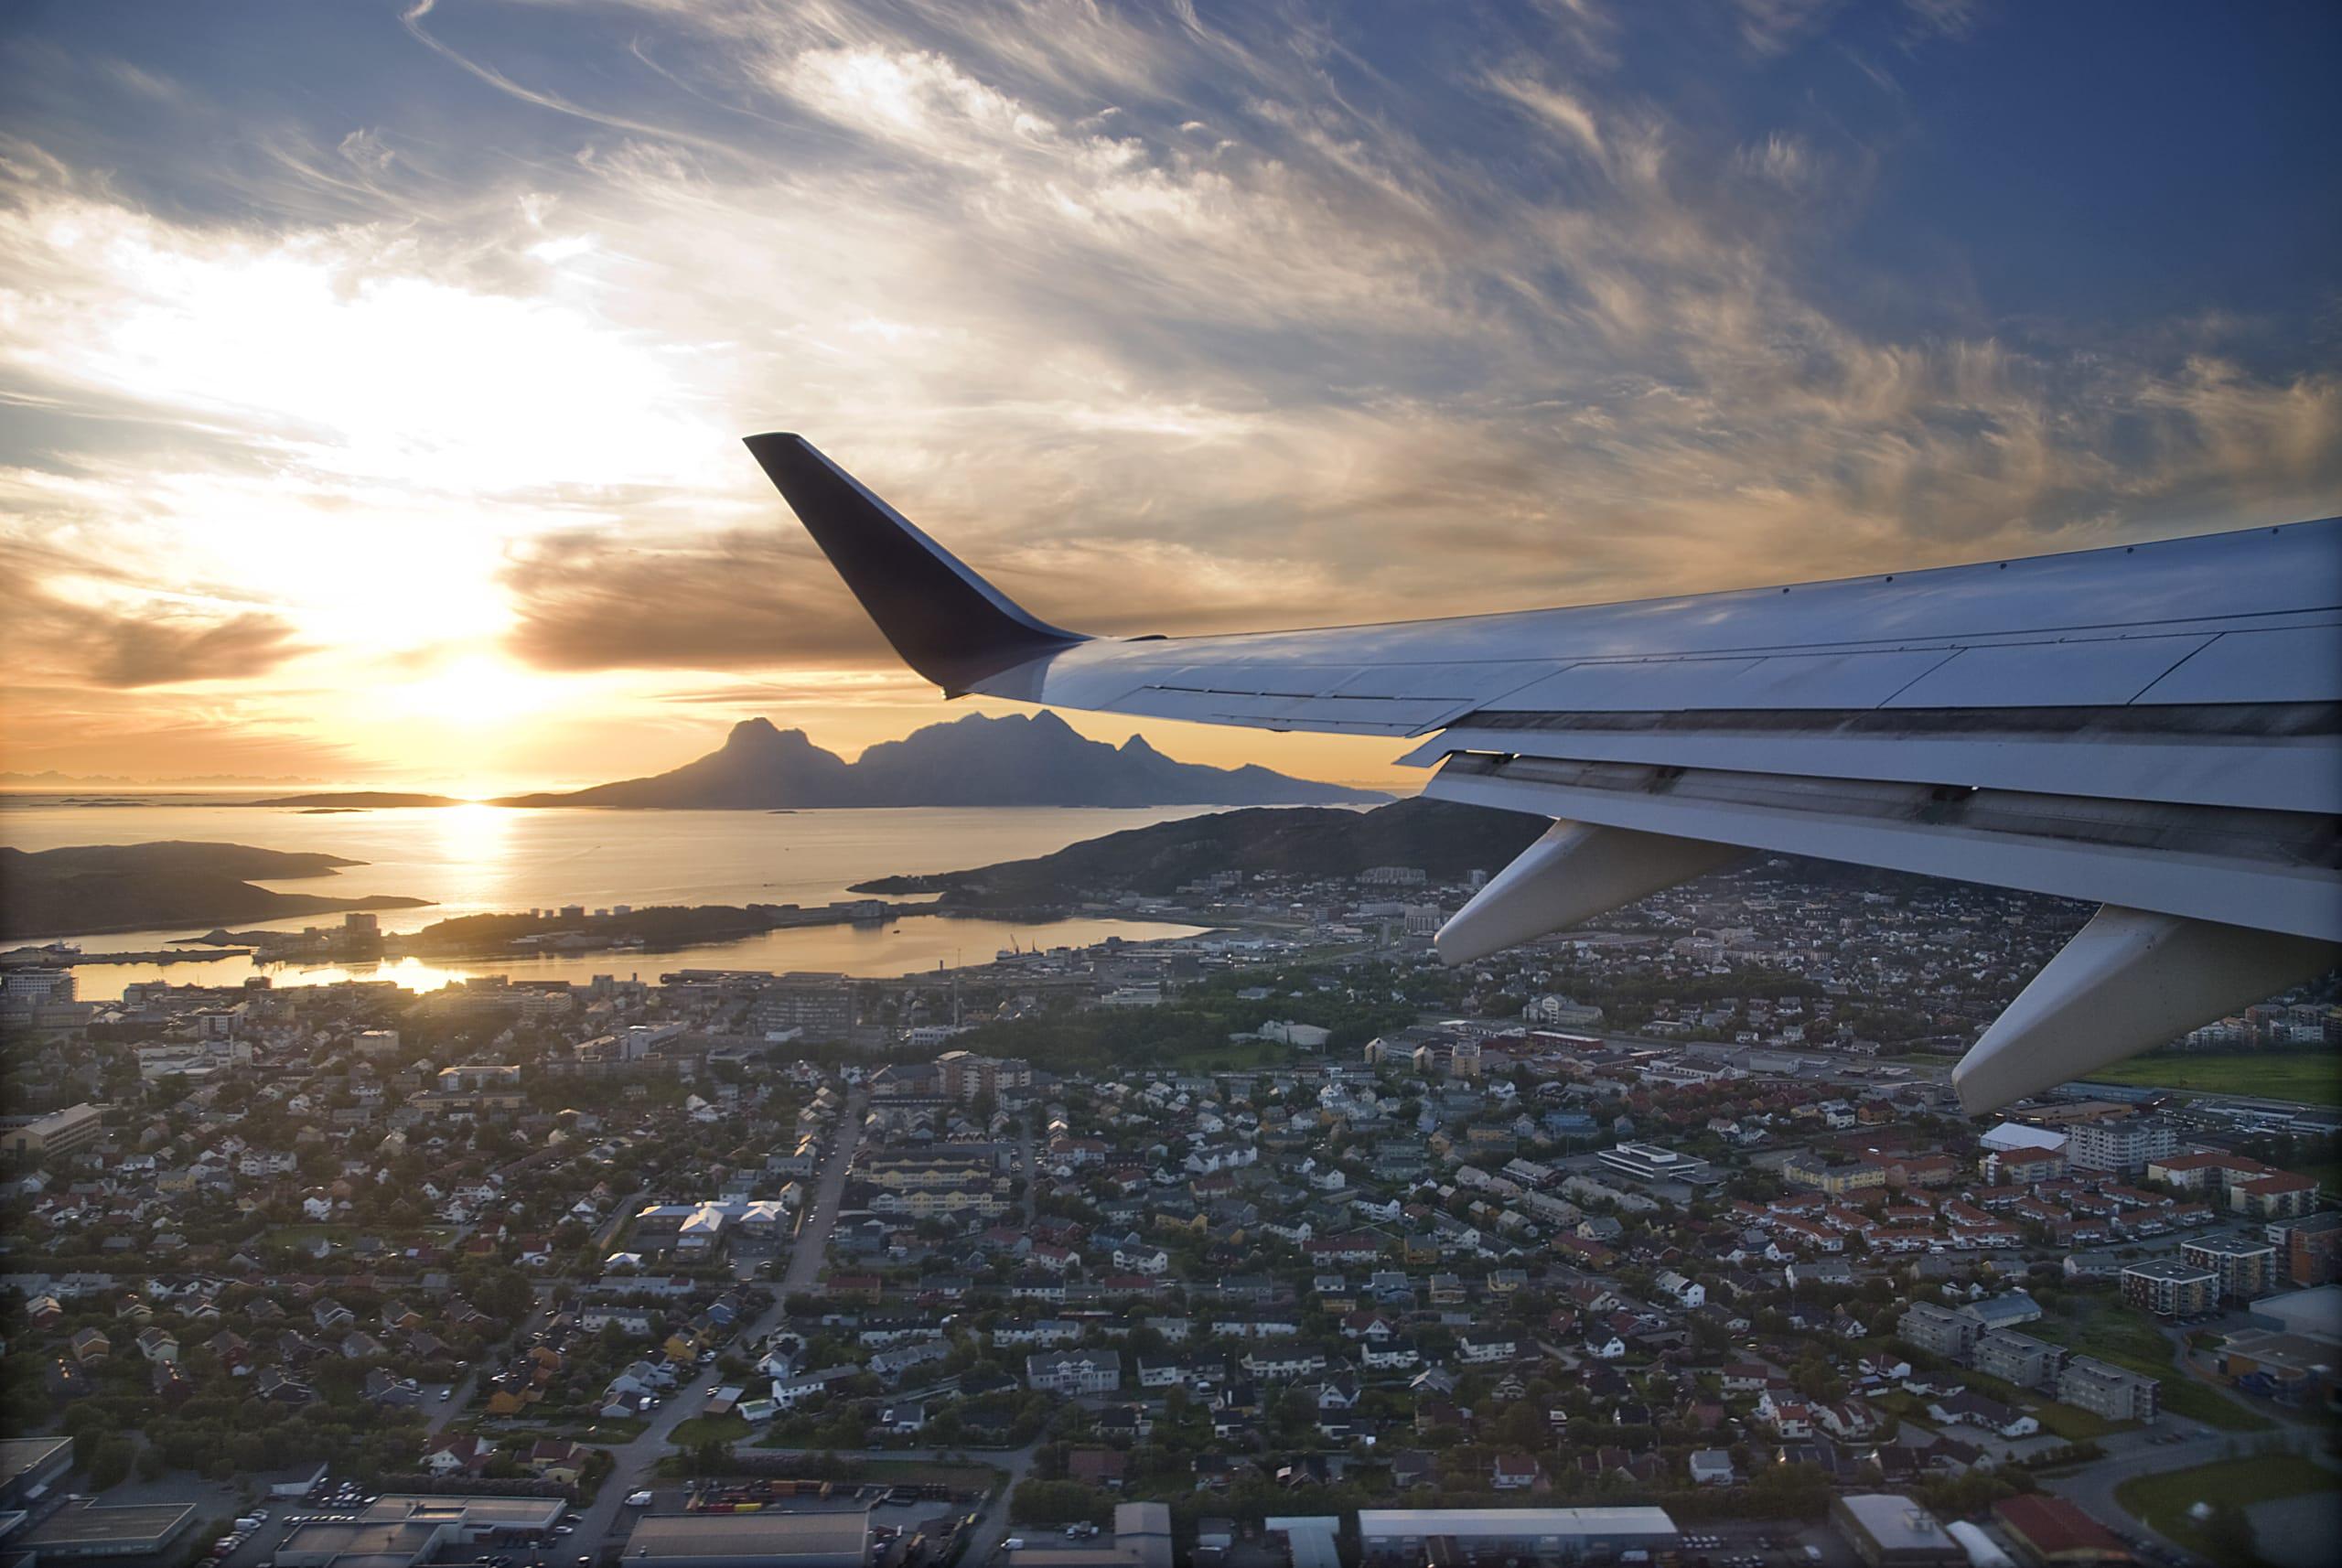 Plane flying over Bodø city at sunset